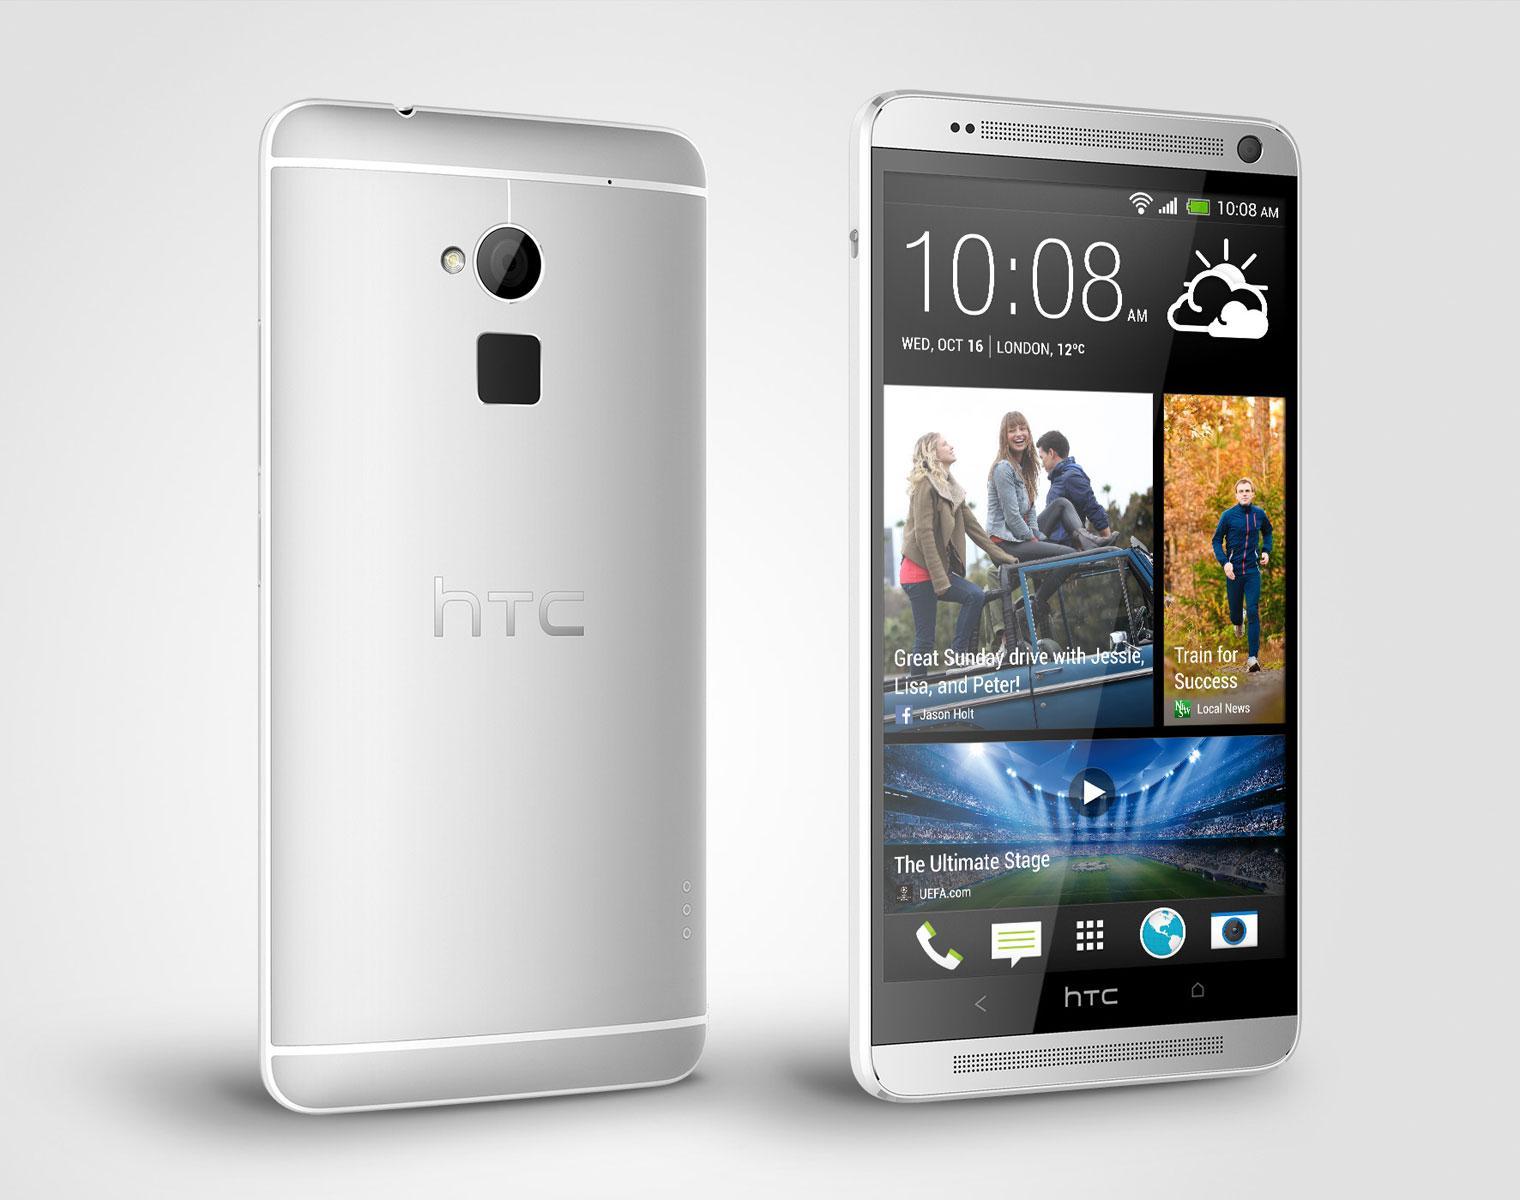 HTC One Max vista frontal y trasera